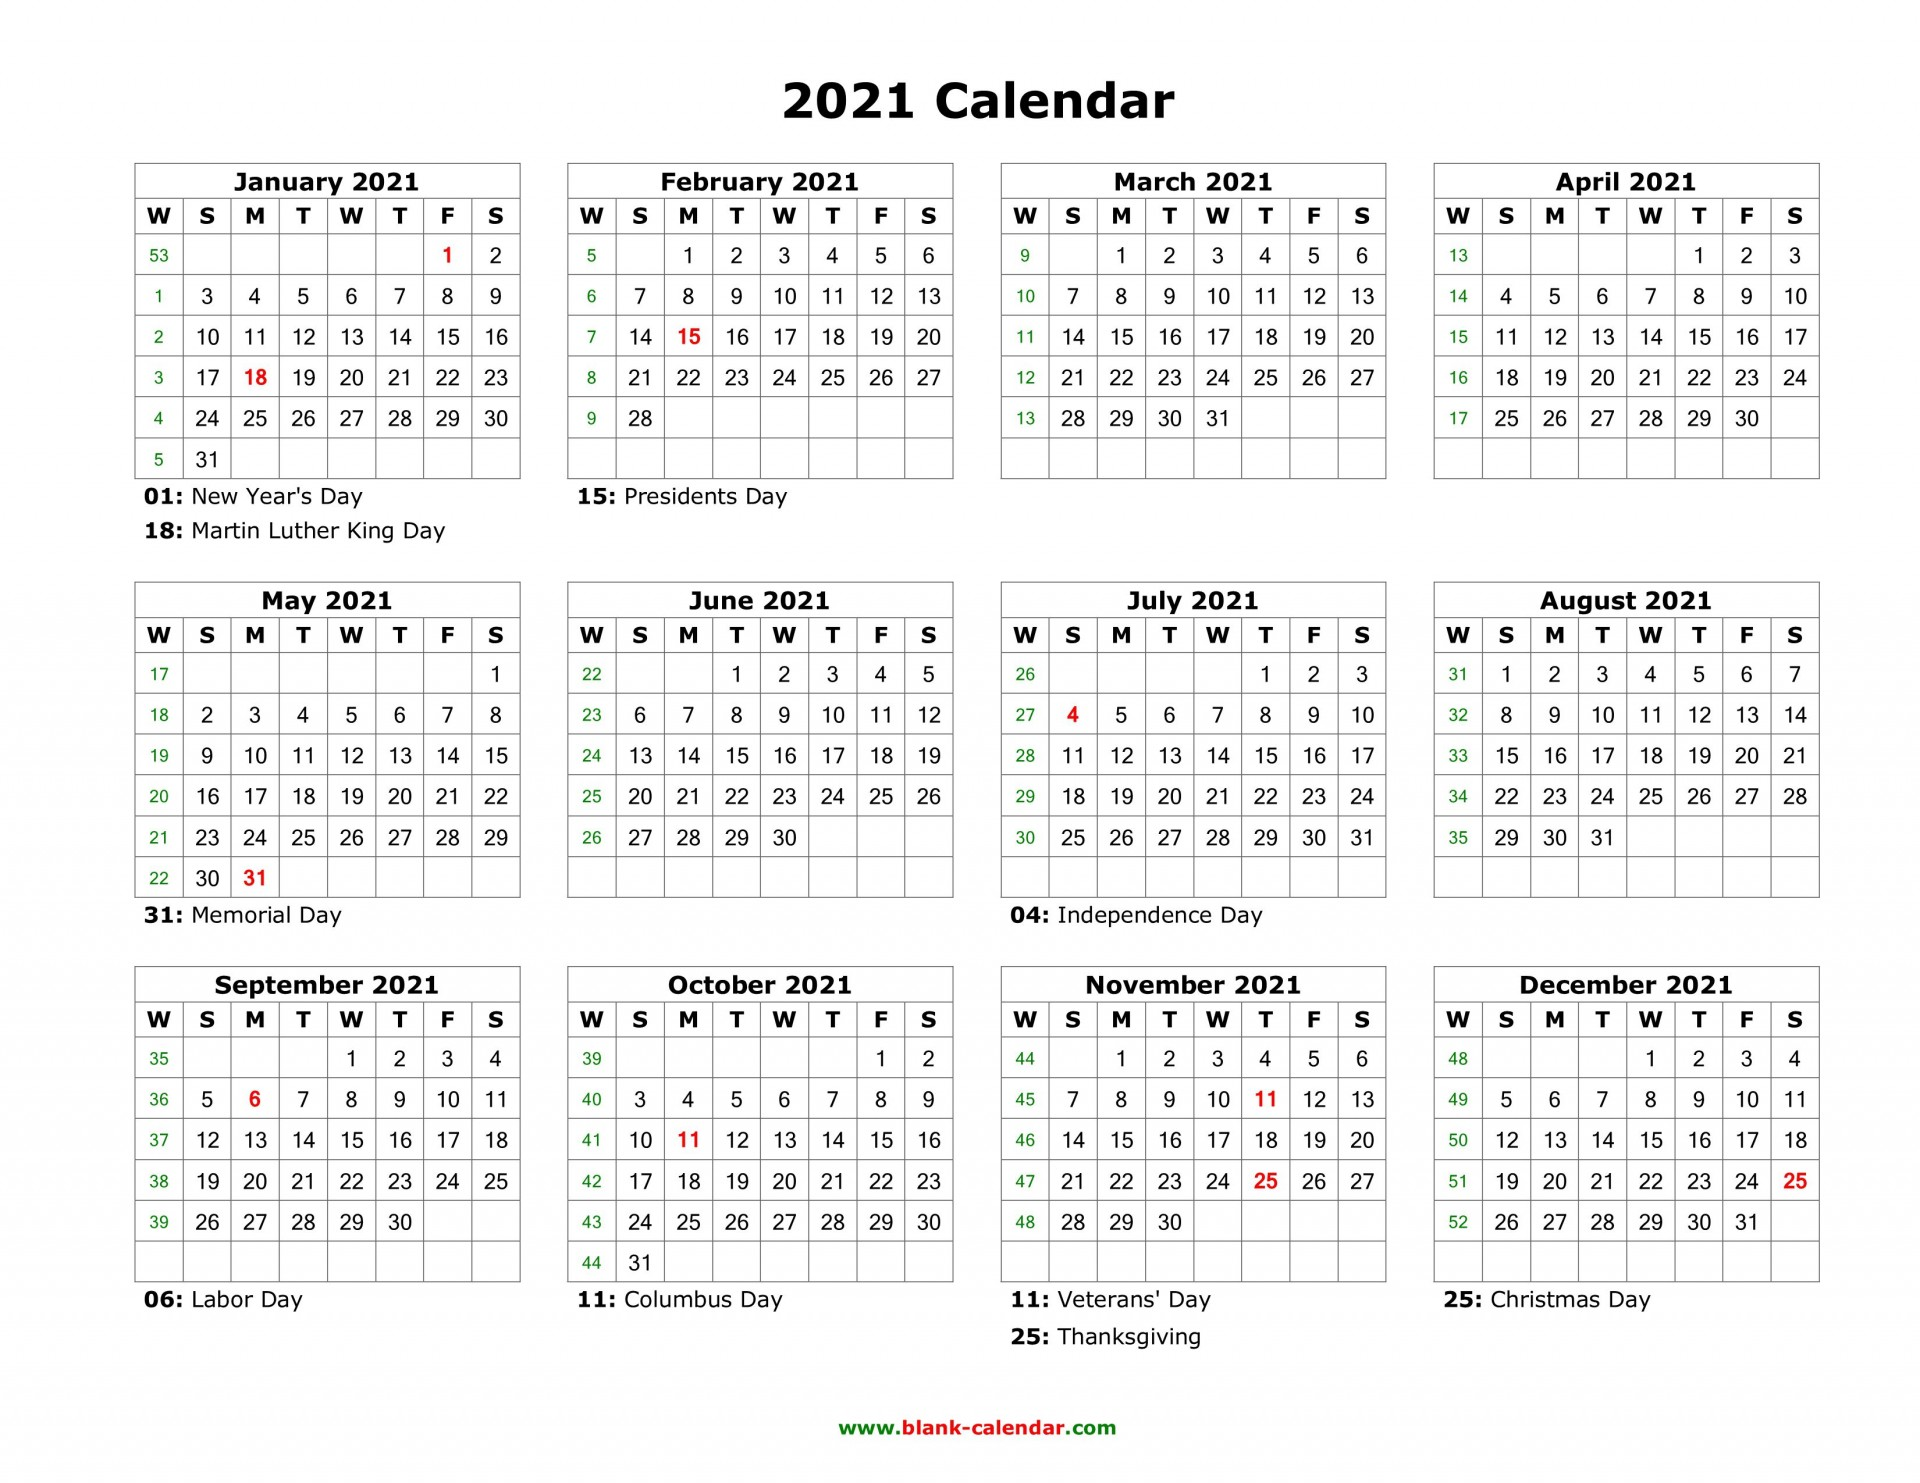 009 Wonderful Editable Calendar Google Doc 2021 Idea 1920